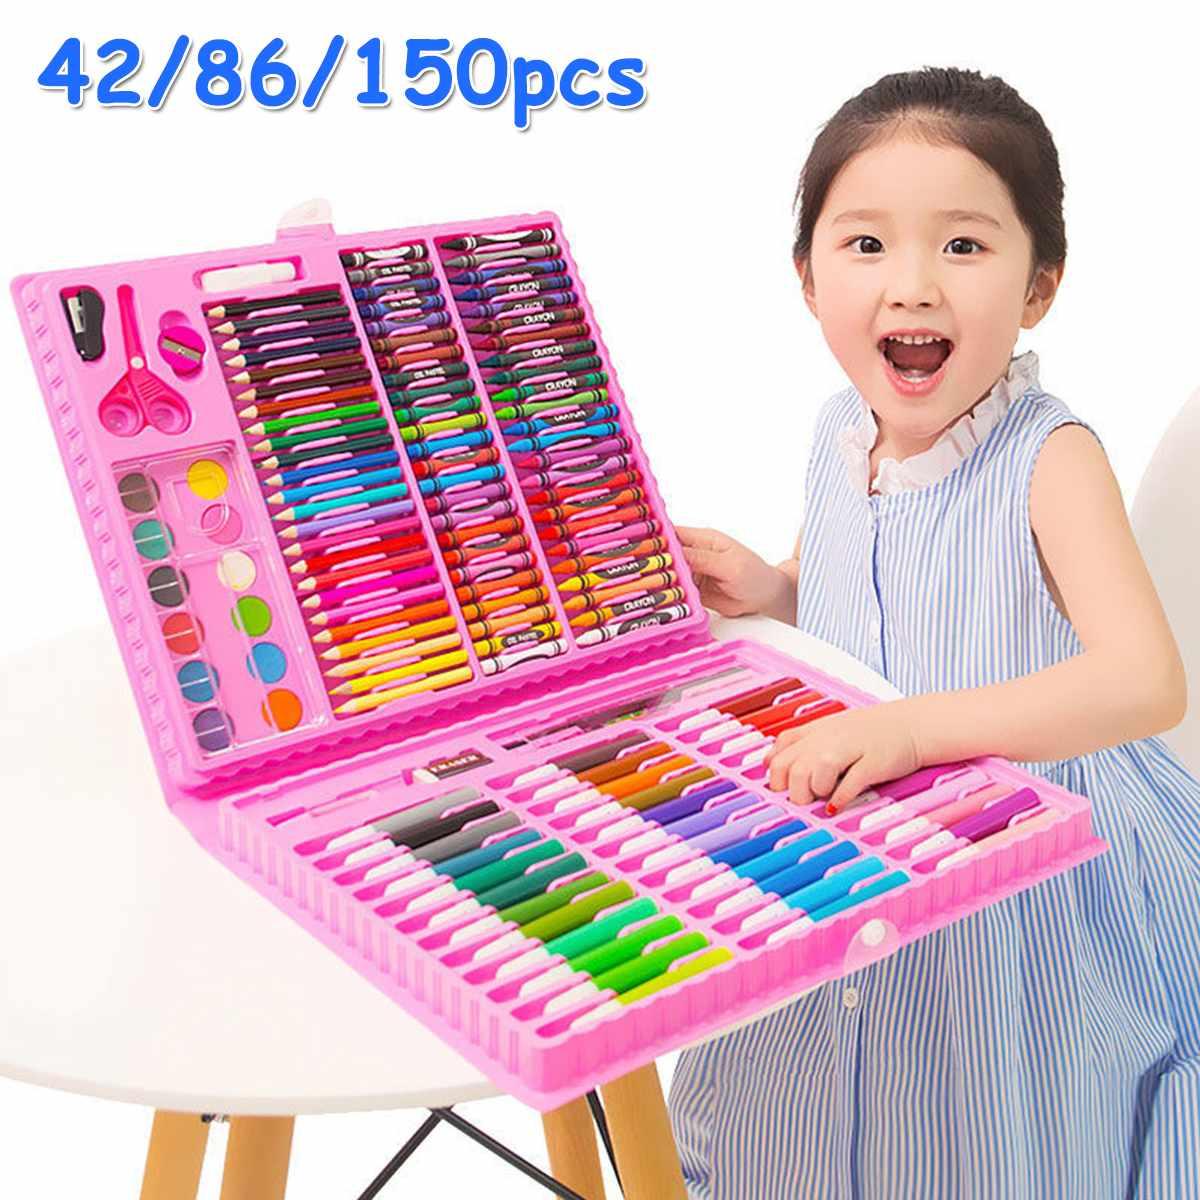 150PCS Colored Pencil Artist Kit Painting Crayon Marker Pen Brush Drawing Tools Set Kindergarten Drawing Supplies Kids Gufts